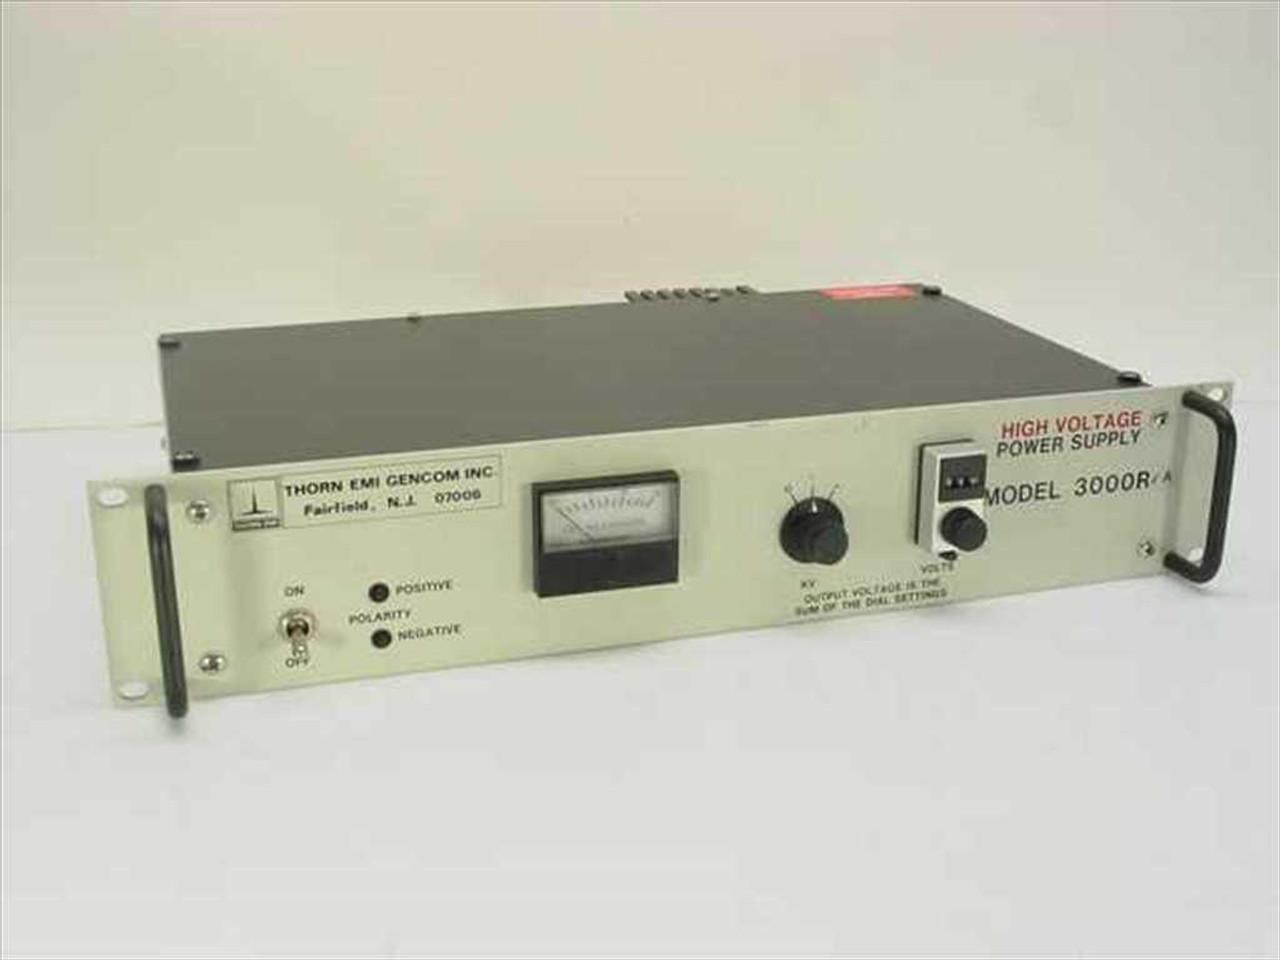 Thorn EMI Gencom Inc 3000R High Voltage Power Supply 0-3 kV DC